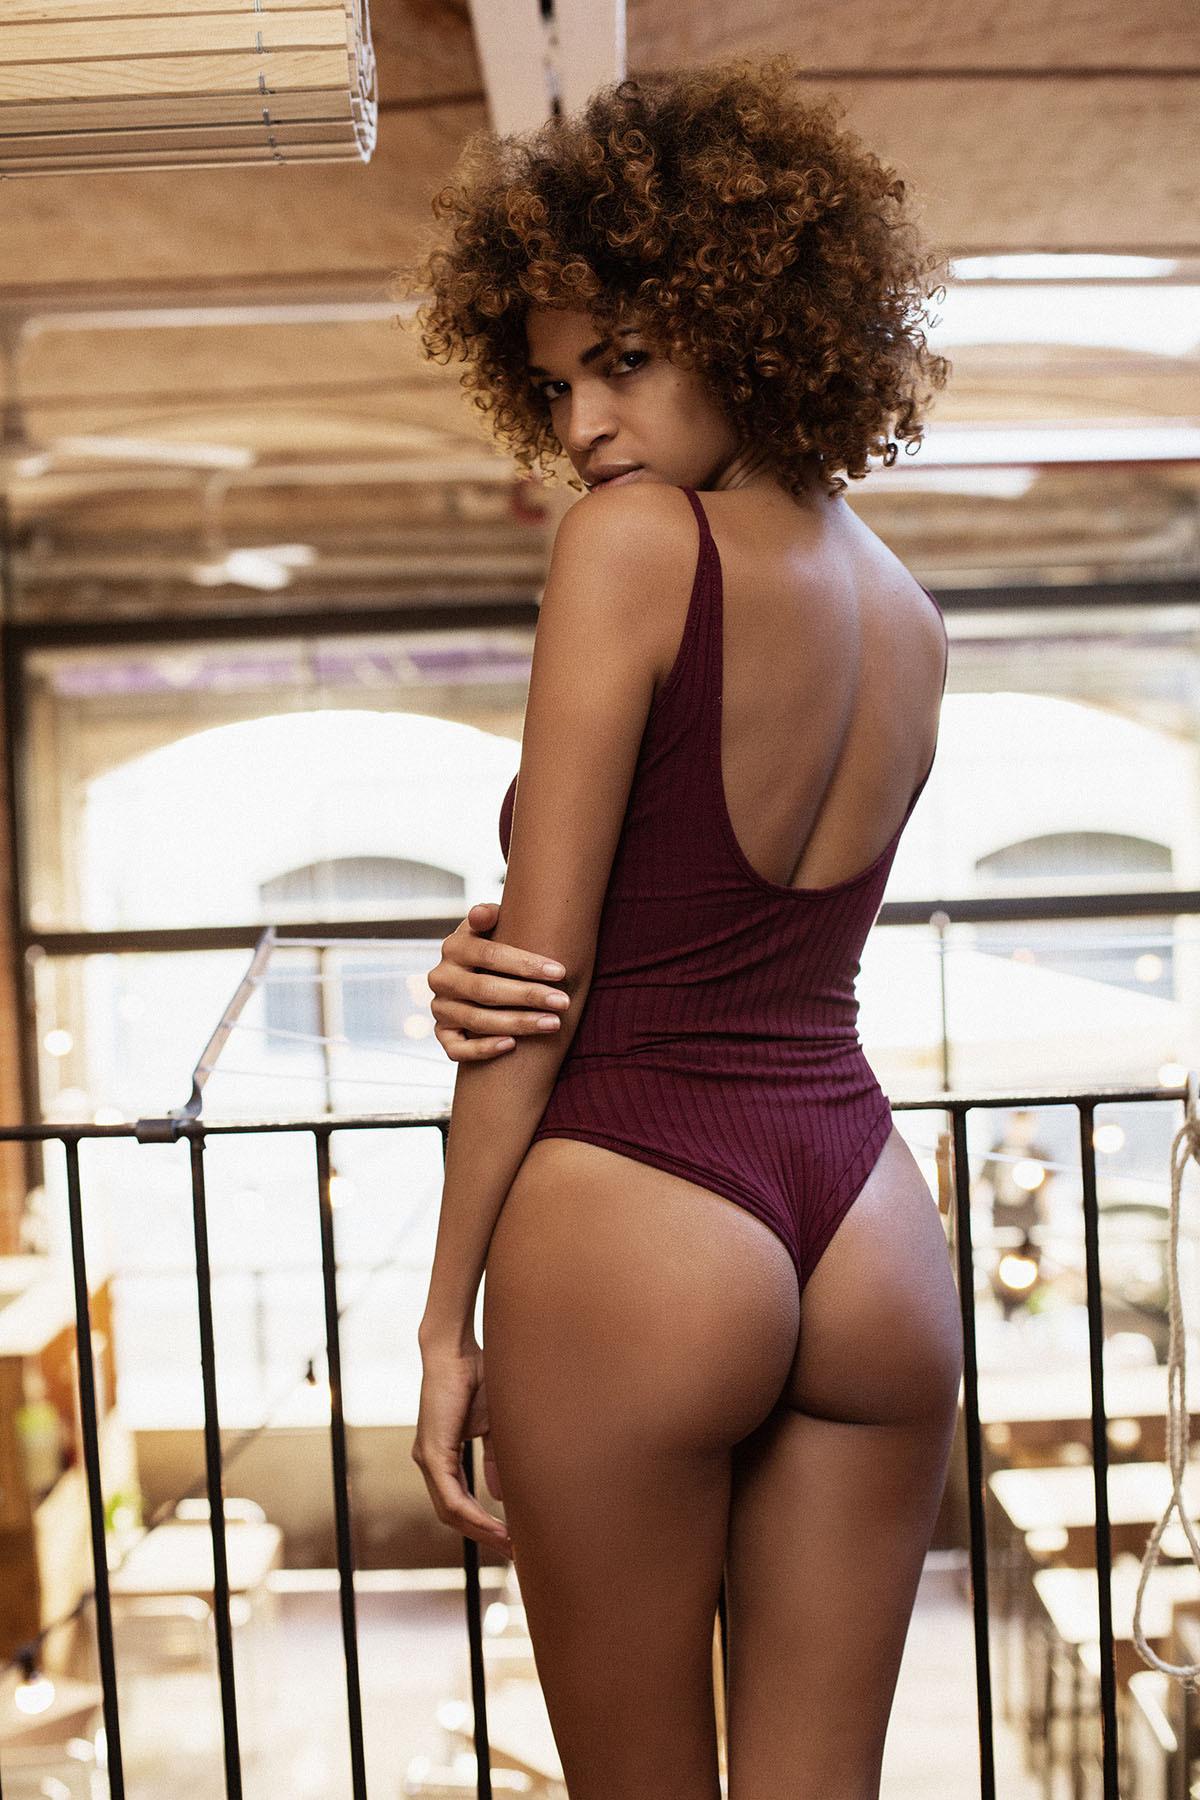 women squatting down nude